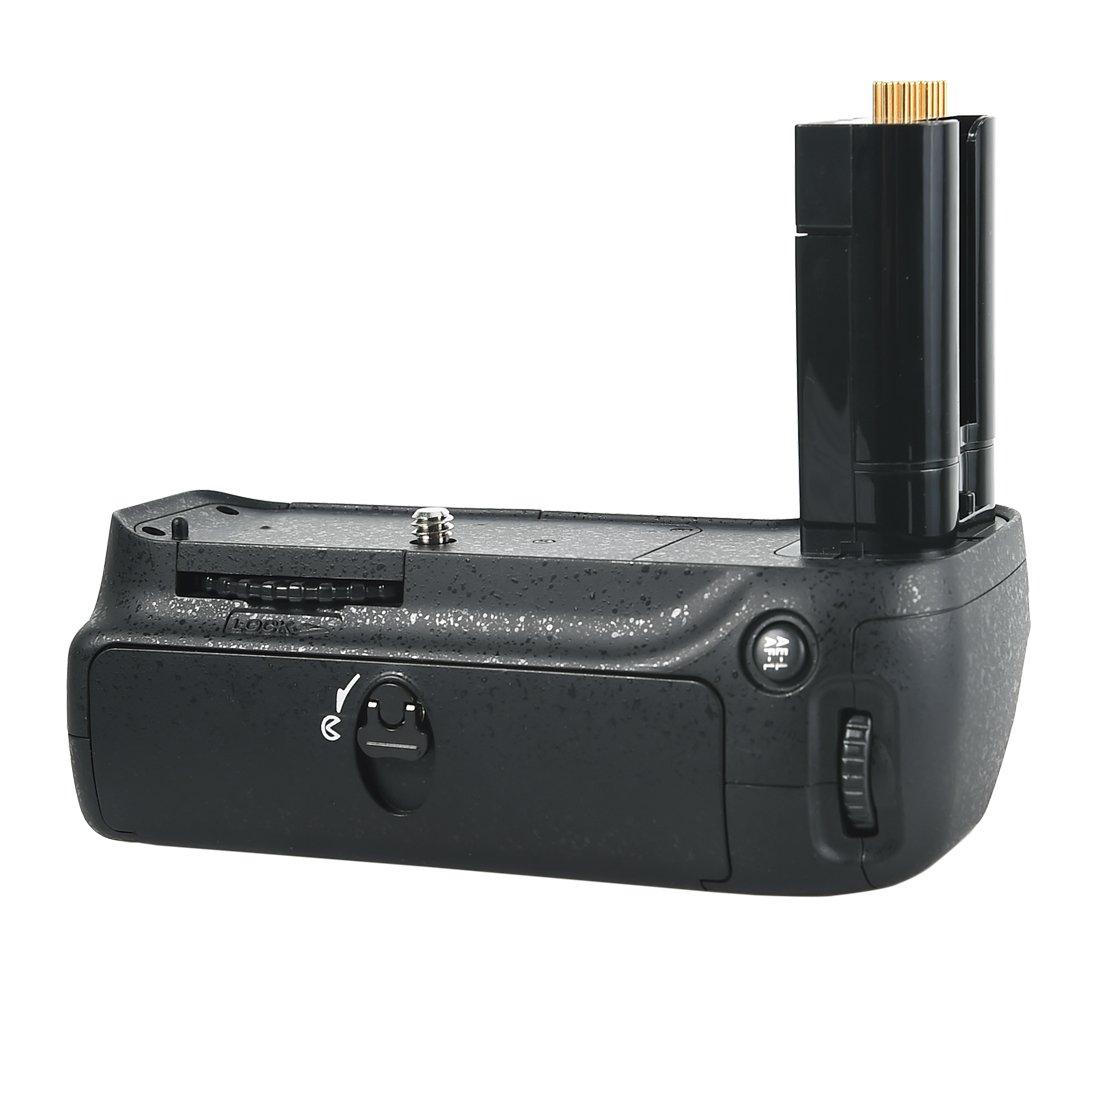 DSTE/® Pro MB-D80 Vertical Battery Grip for Nikon D80 D90 SLR Digital Camera as EN-EL3E